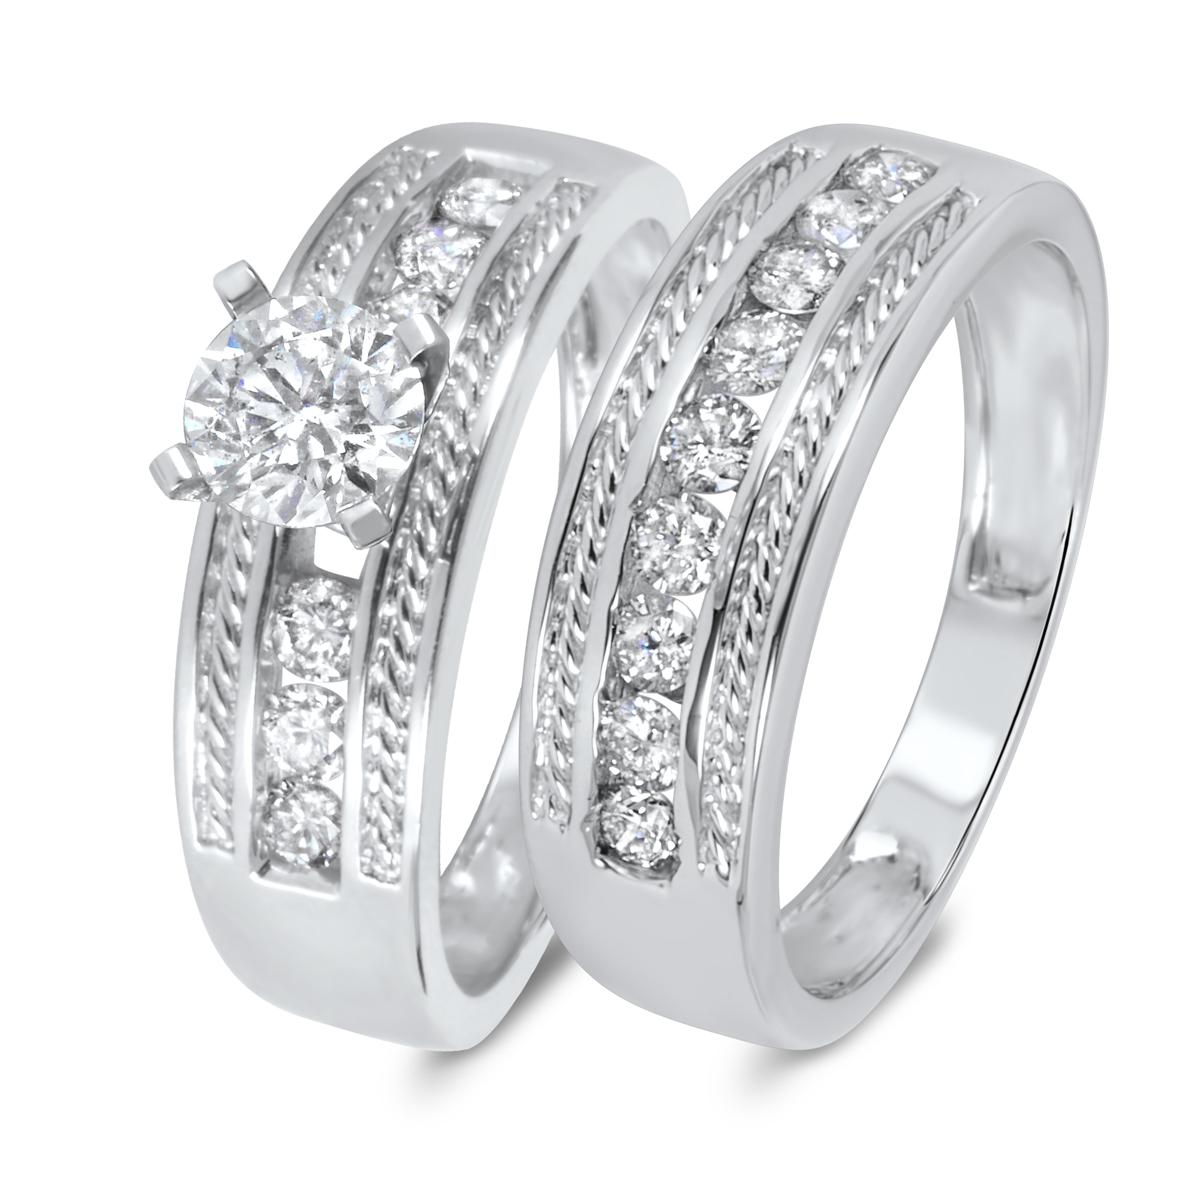 1 1/6 CT. T.W. Diamond Women's Bridal Wedding Ring Set 14K White Gold